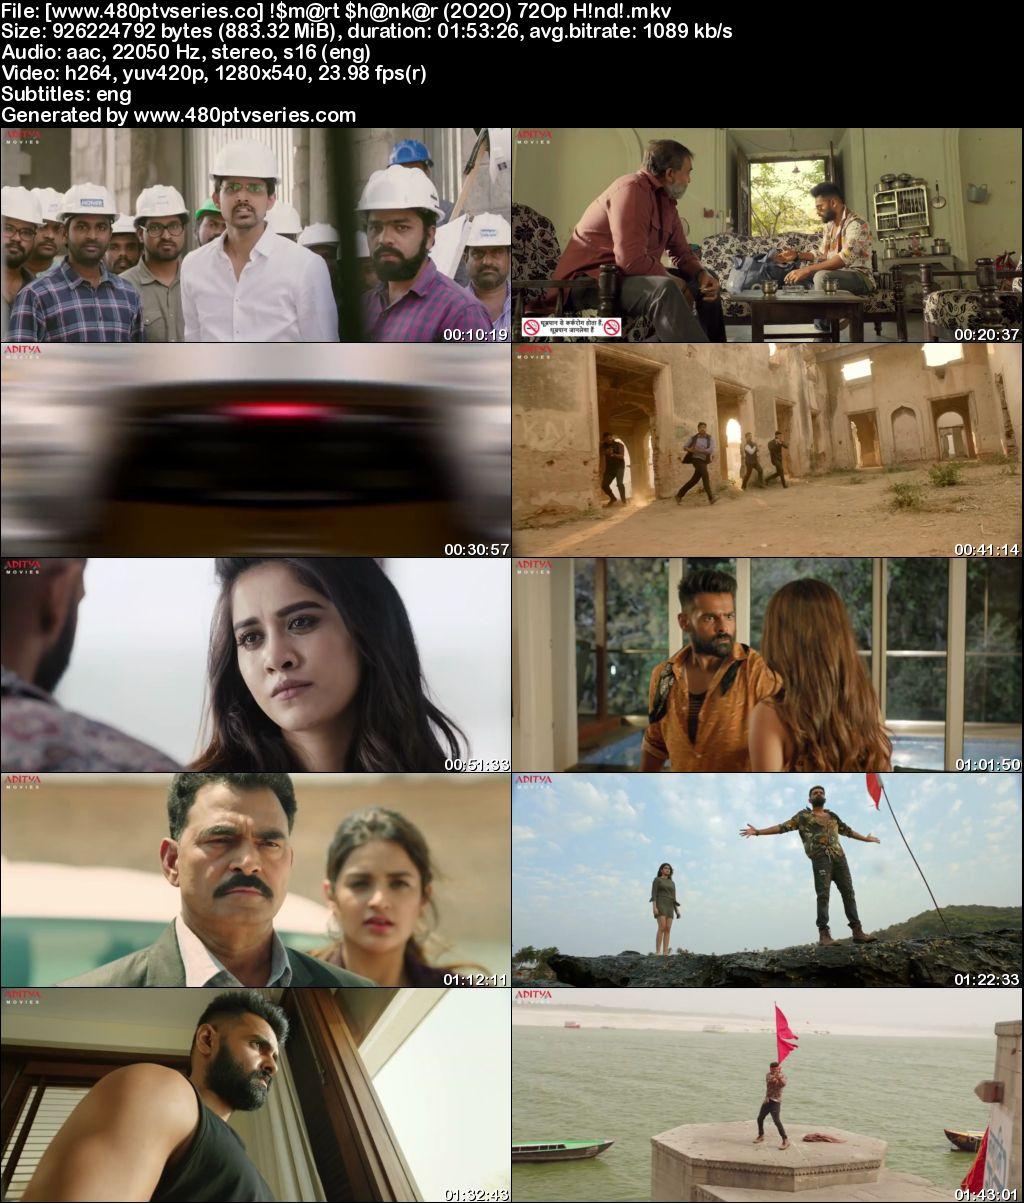 iSmart Shankar (2020) Full Hindi Dubbed Movie Download 480p 720p HDRip Free Watch Online Full Movie Download Worldfree4u 9xmovies